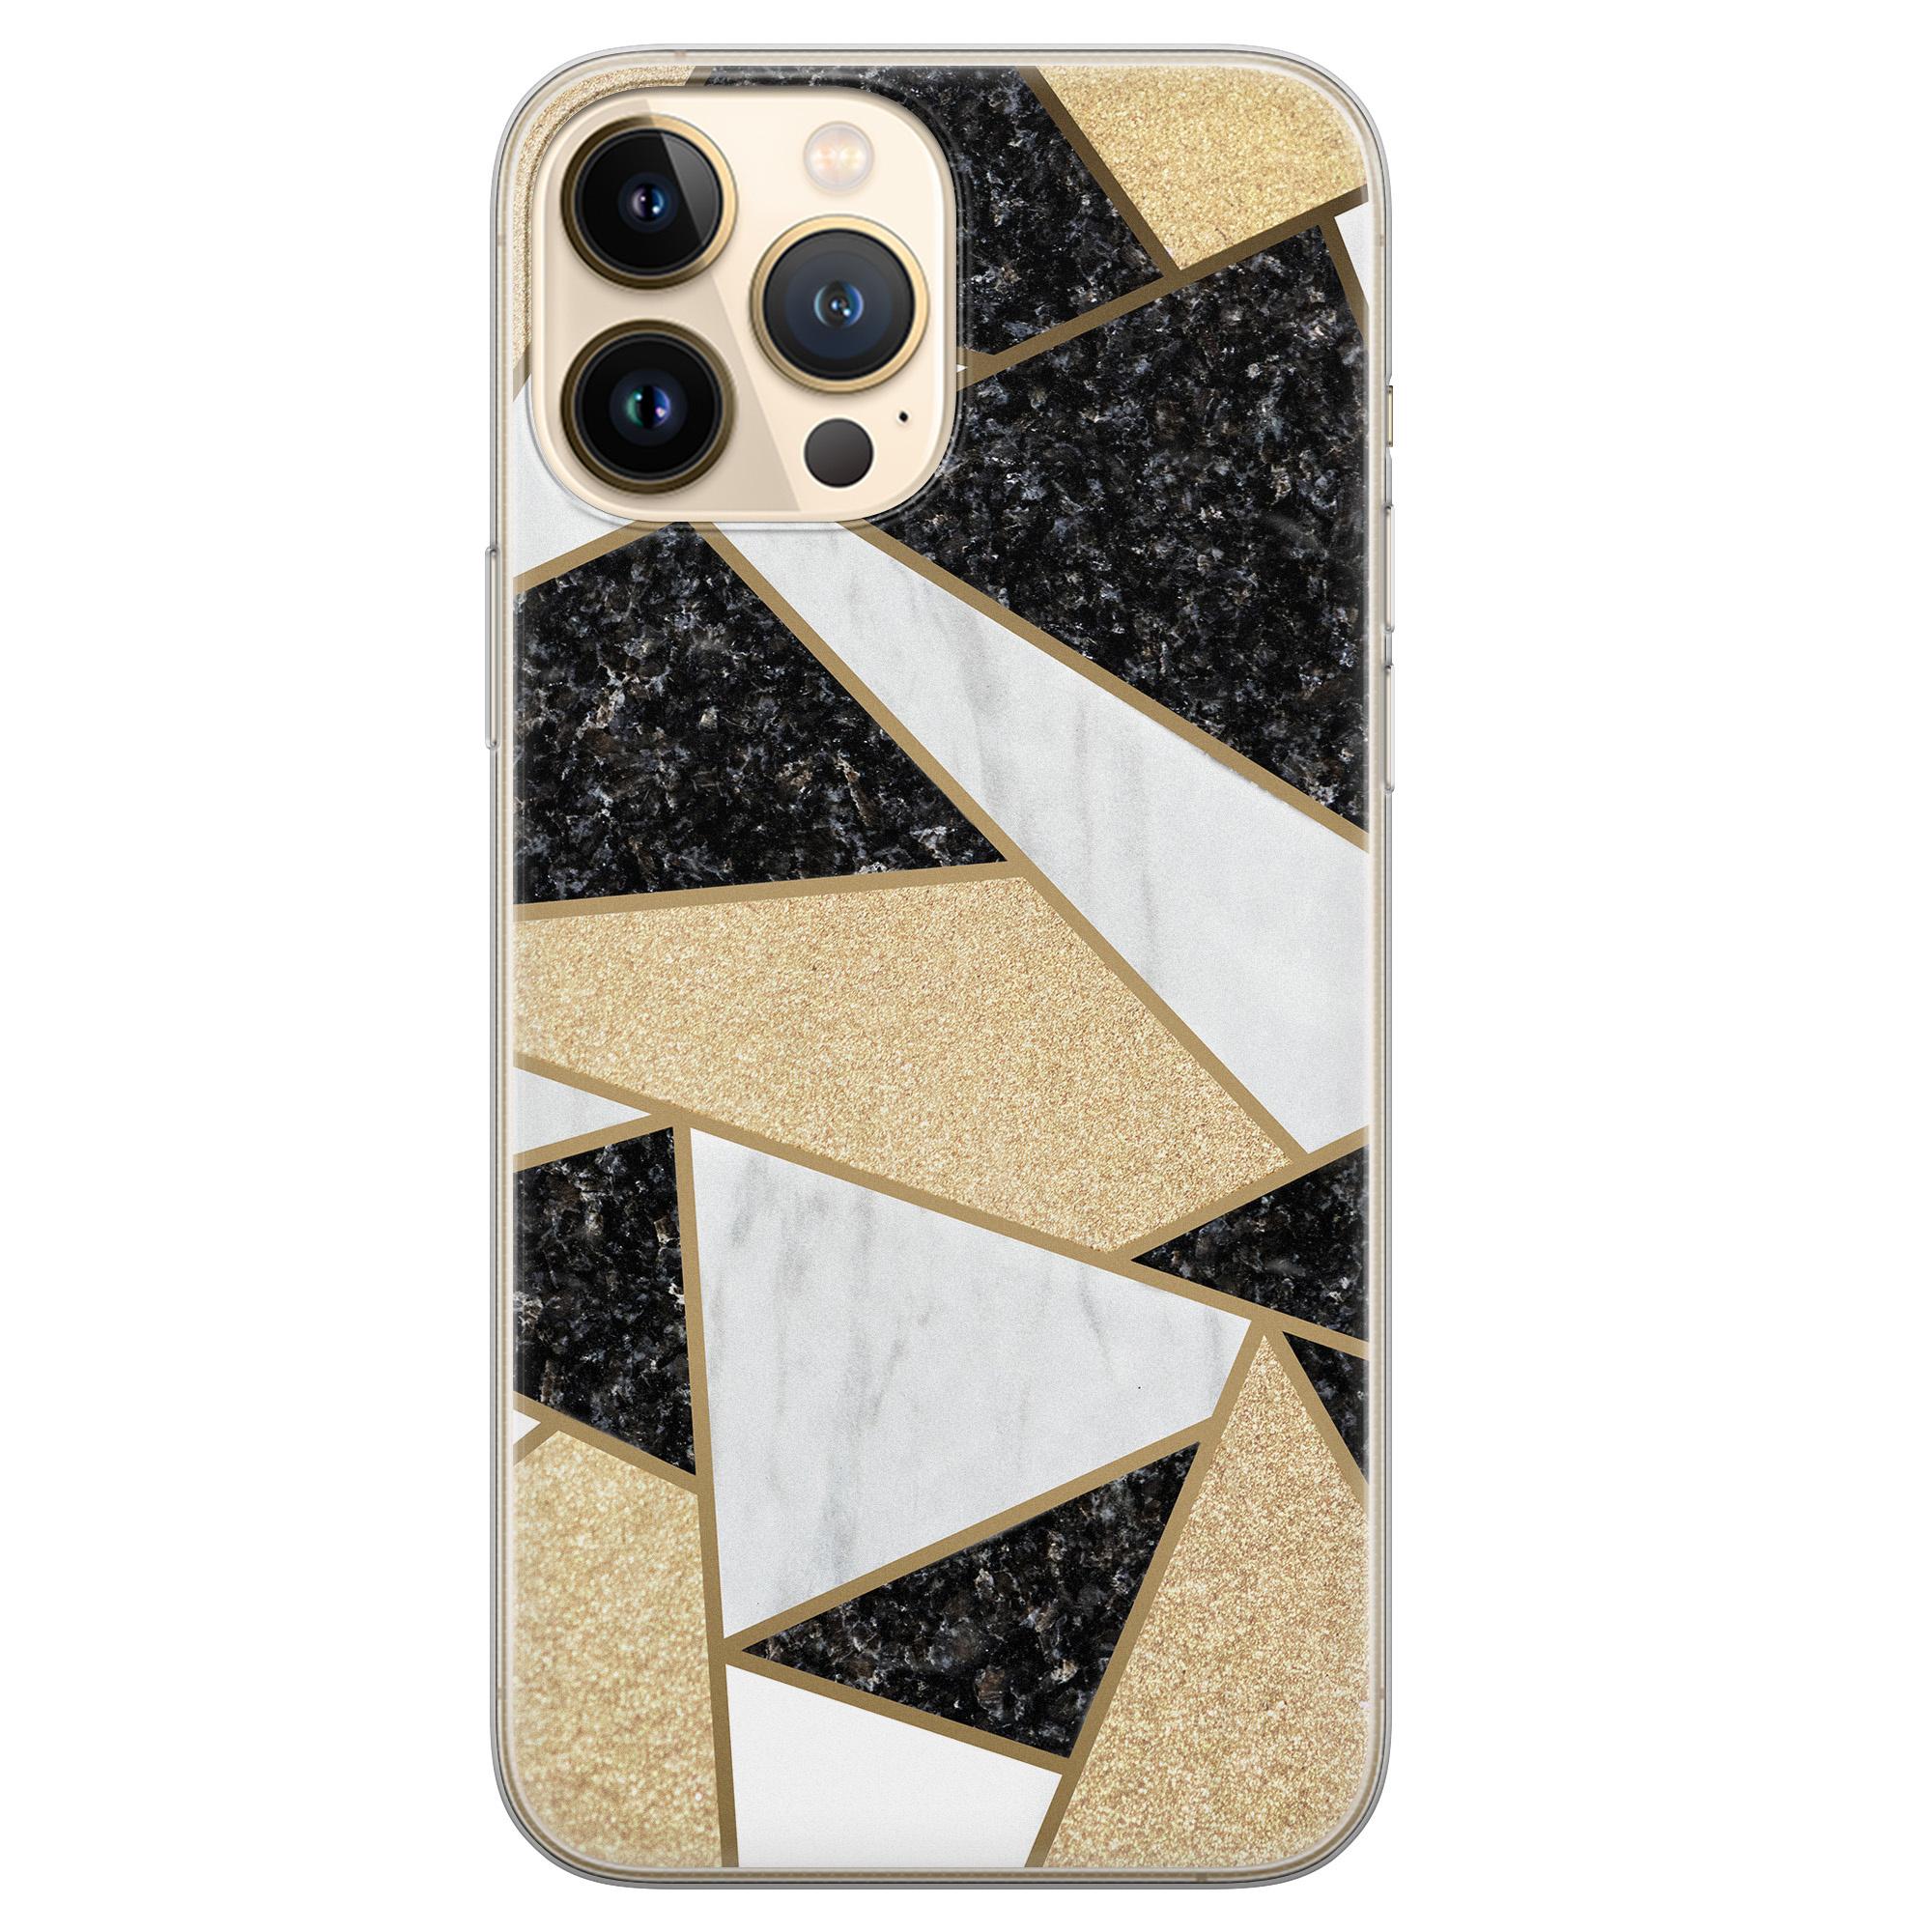 Leuke Telefoonhoesjes iPhone 13 Pro Max siliconen hoesje - Goud abstract